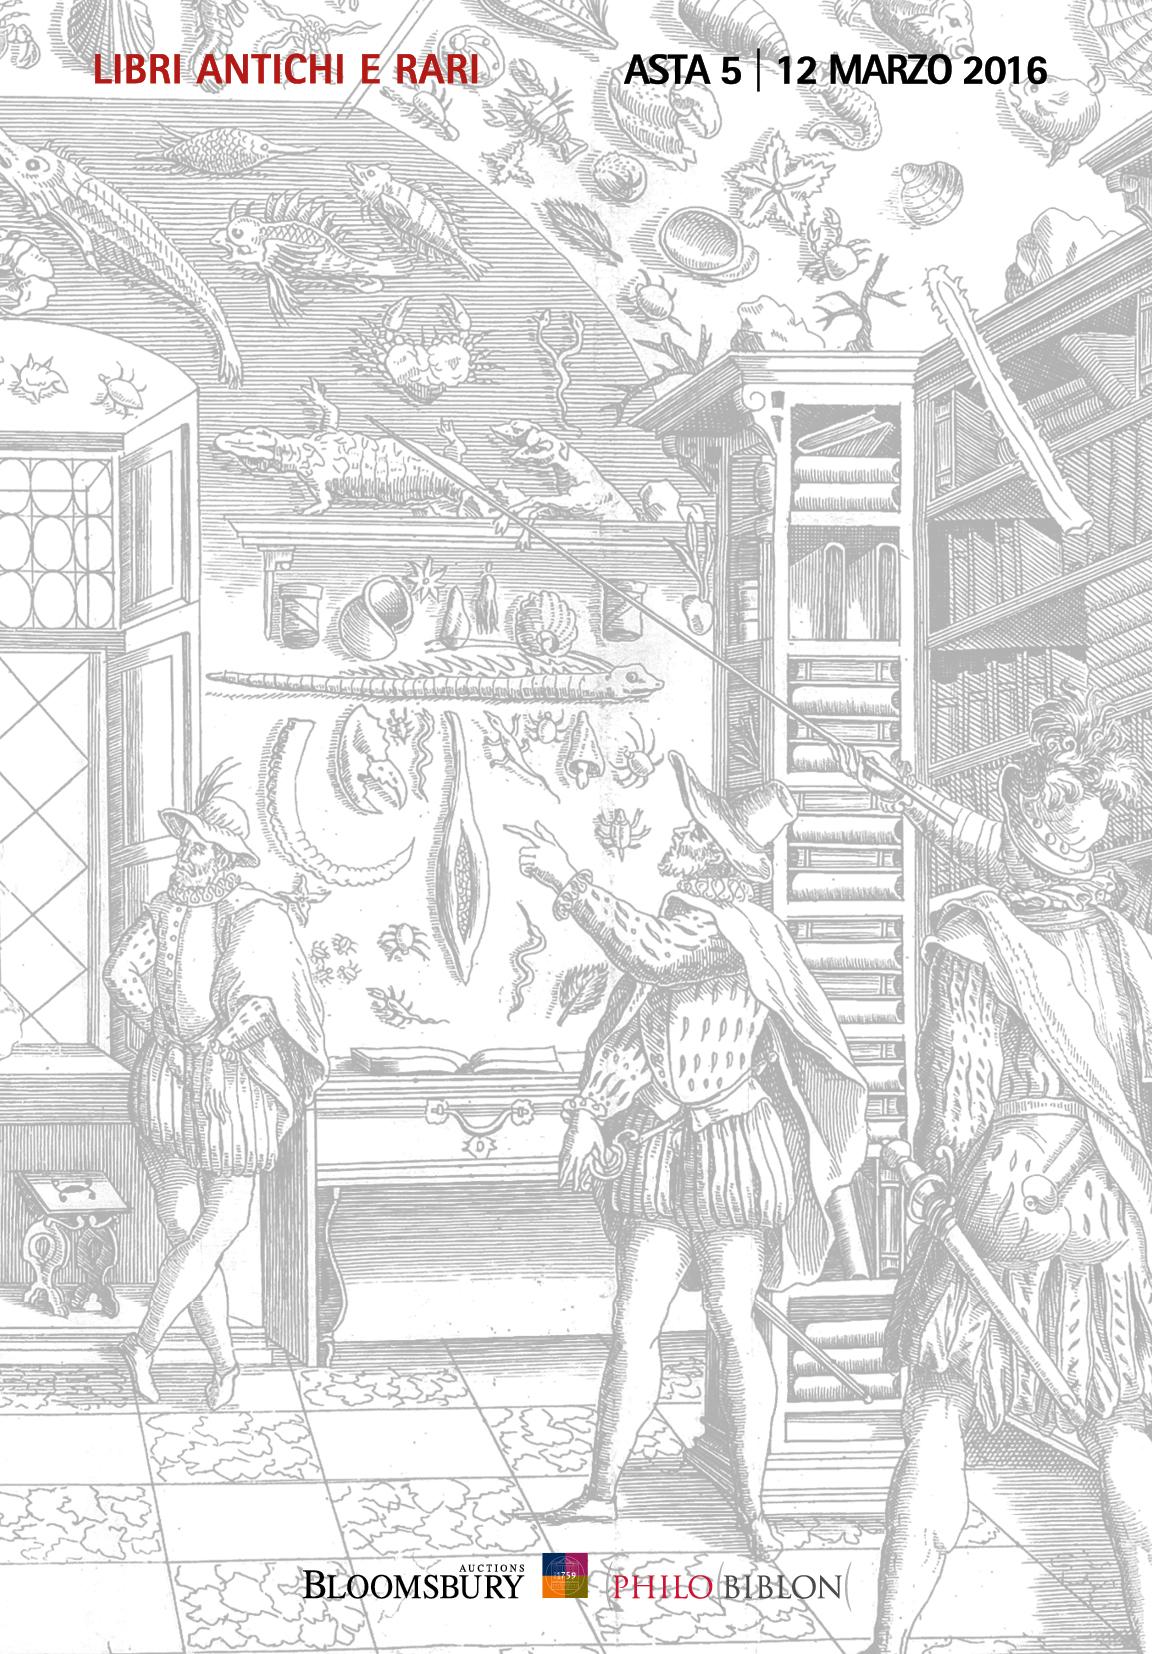 Asta 5 | Libri Antichi e Rari